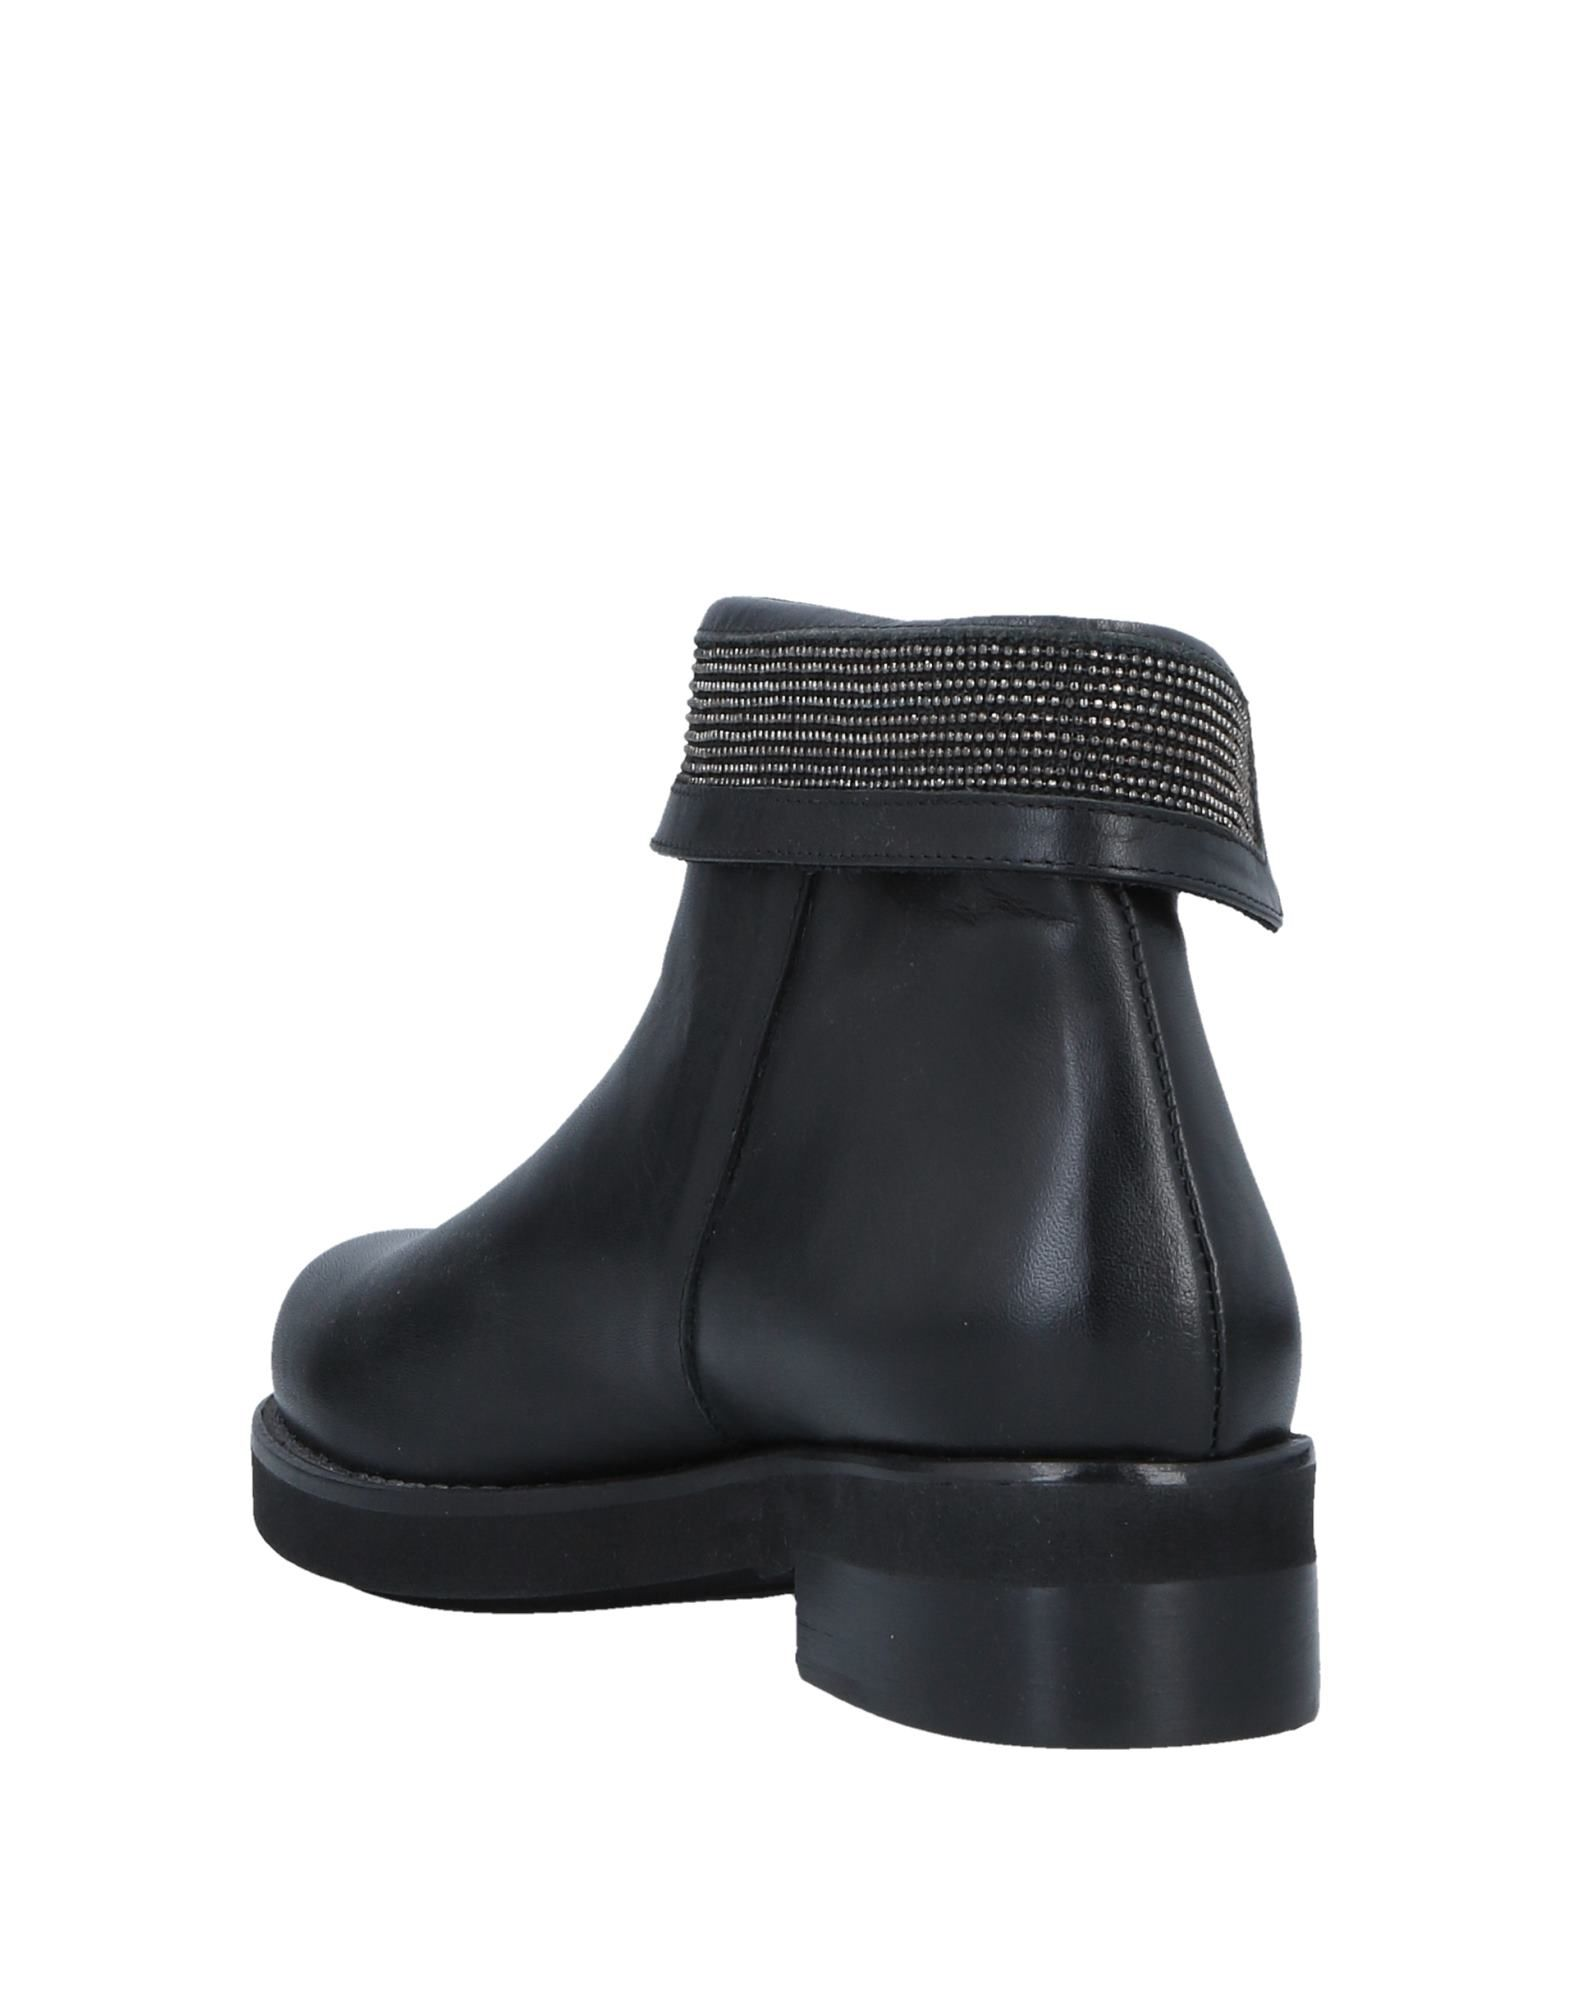 Gut G um billige Schuhe zu tragenCristian G Gut Stiefelette Damen  11518118GU 4d1560